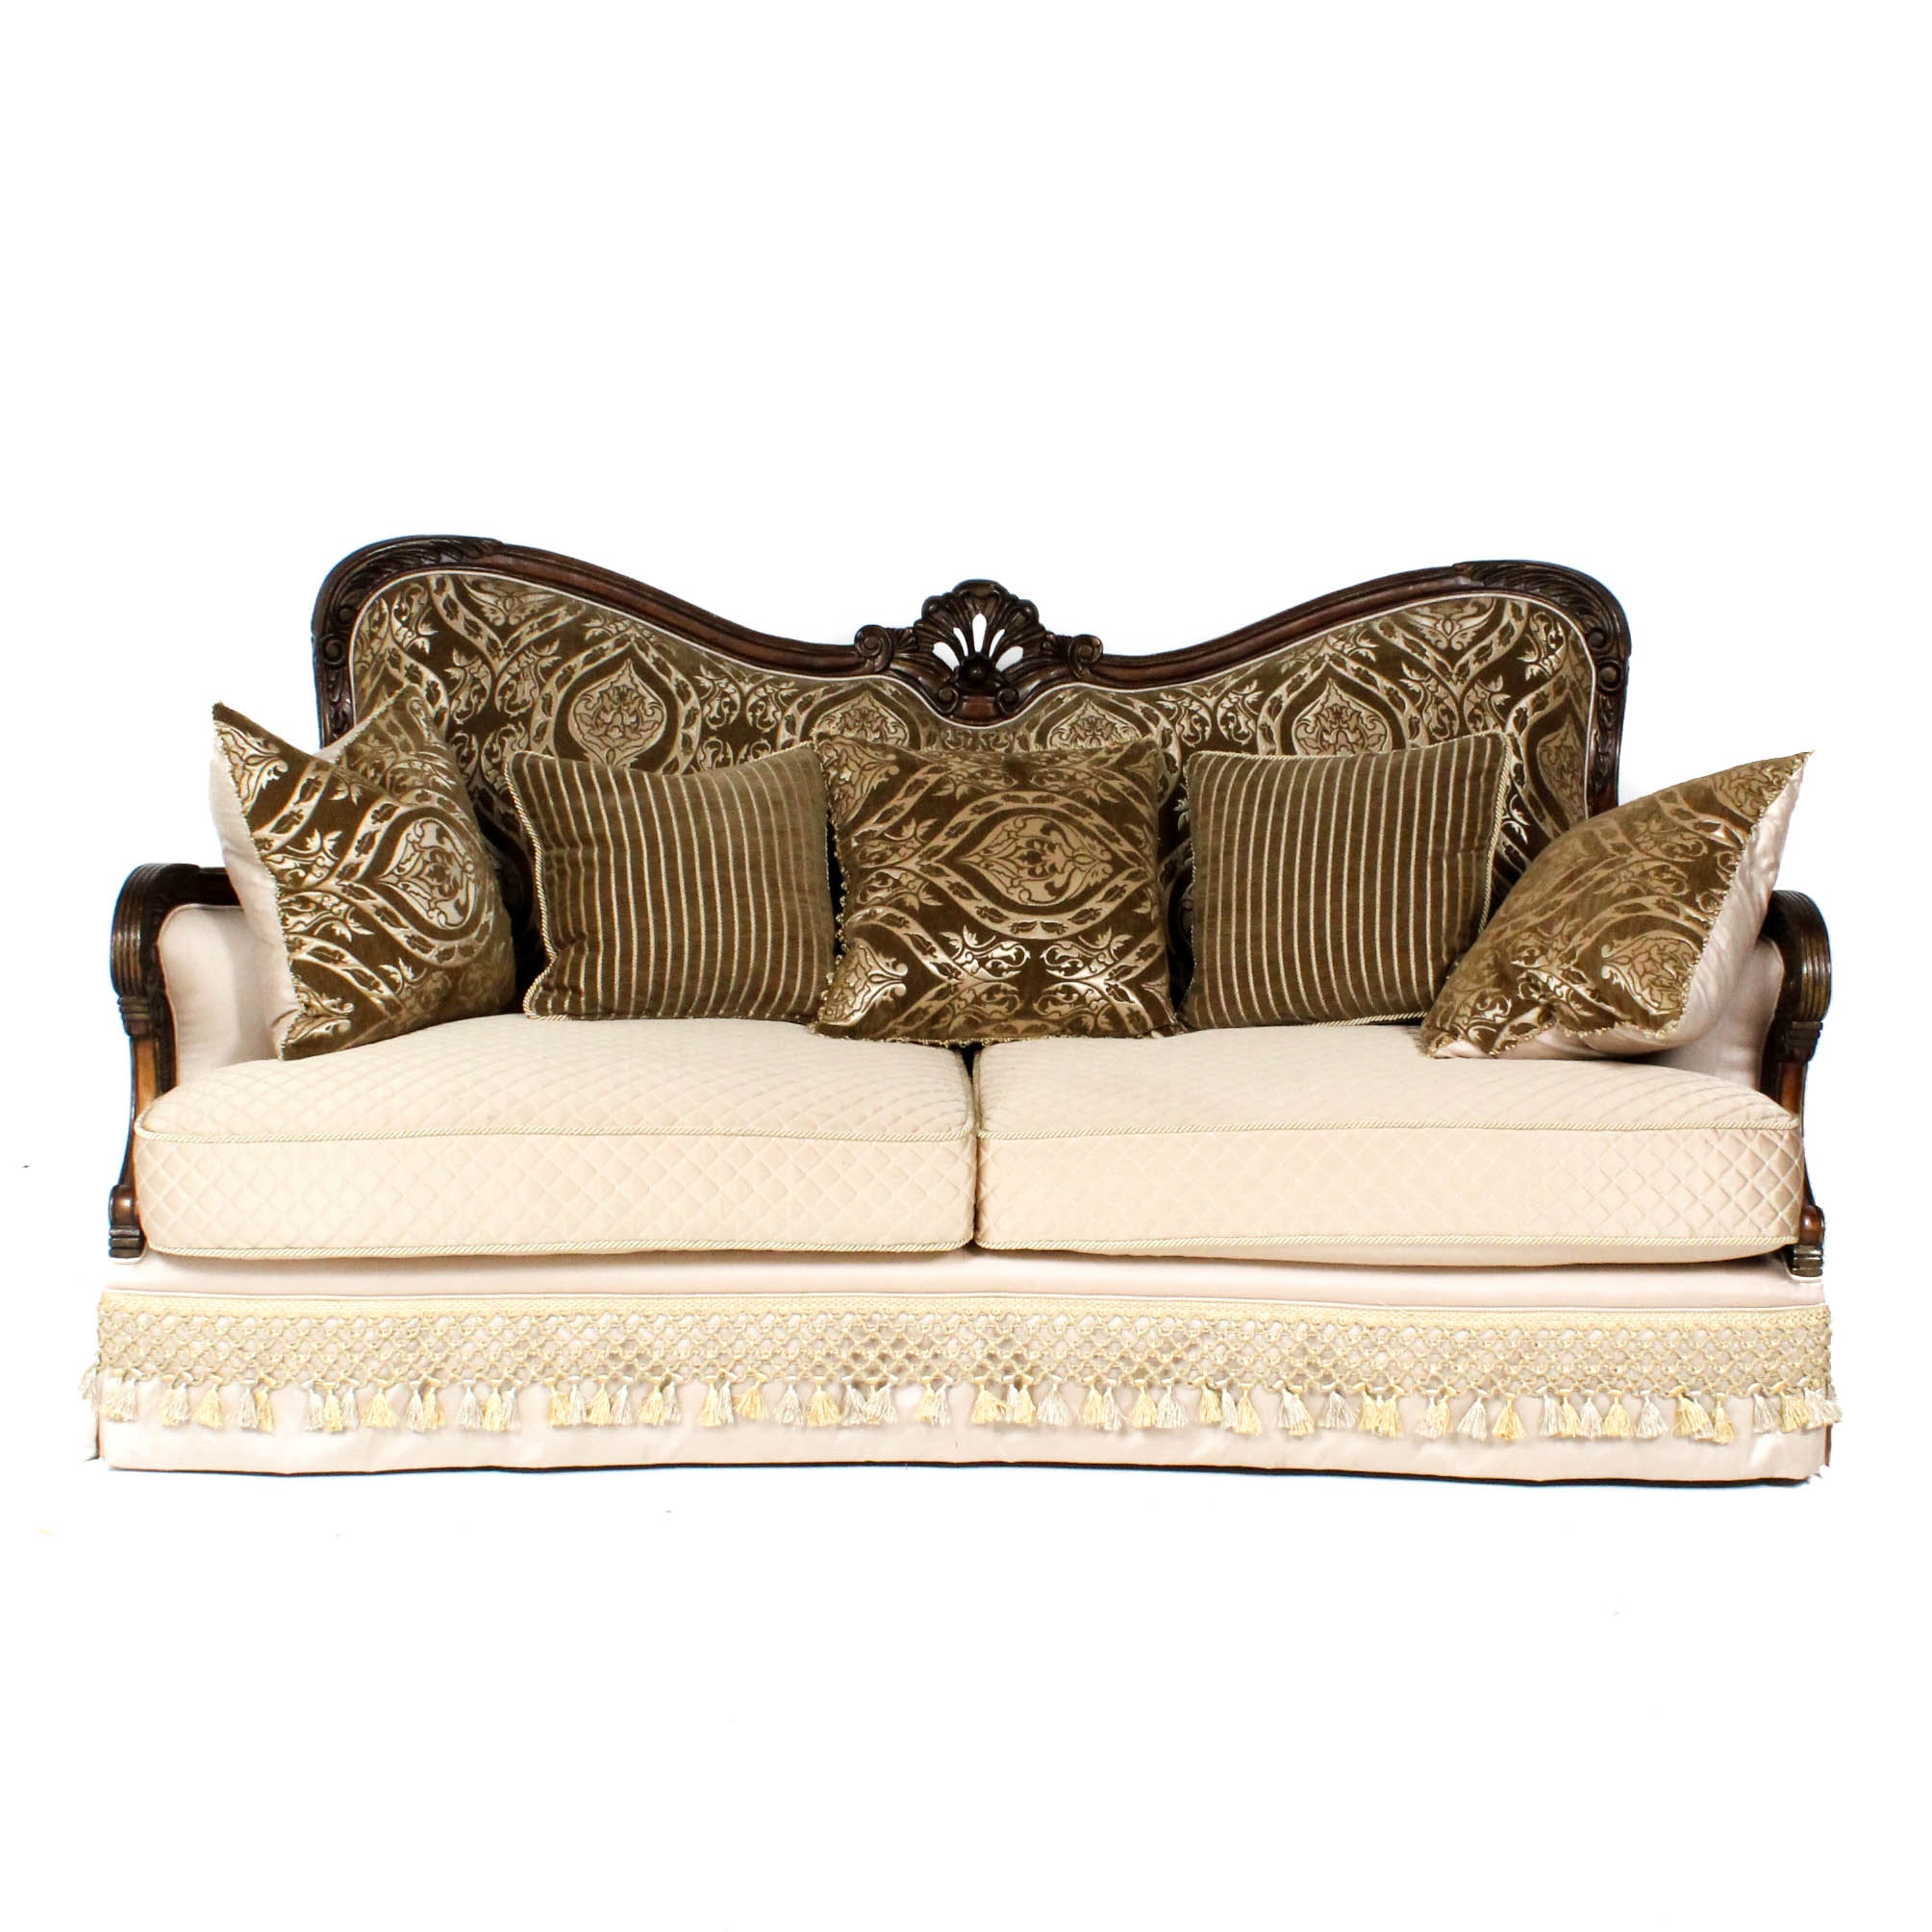 Michael Amini Quilted Sofa